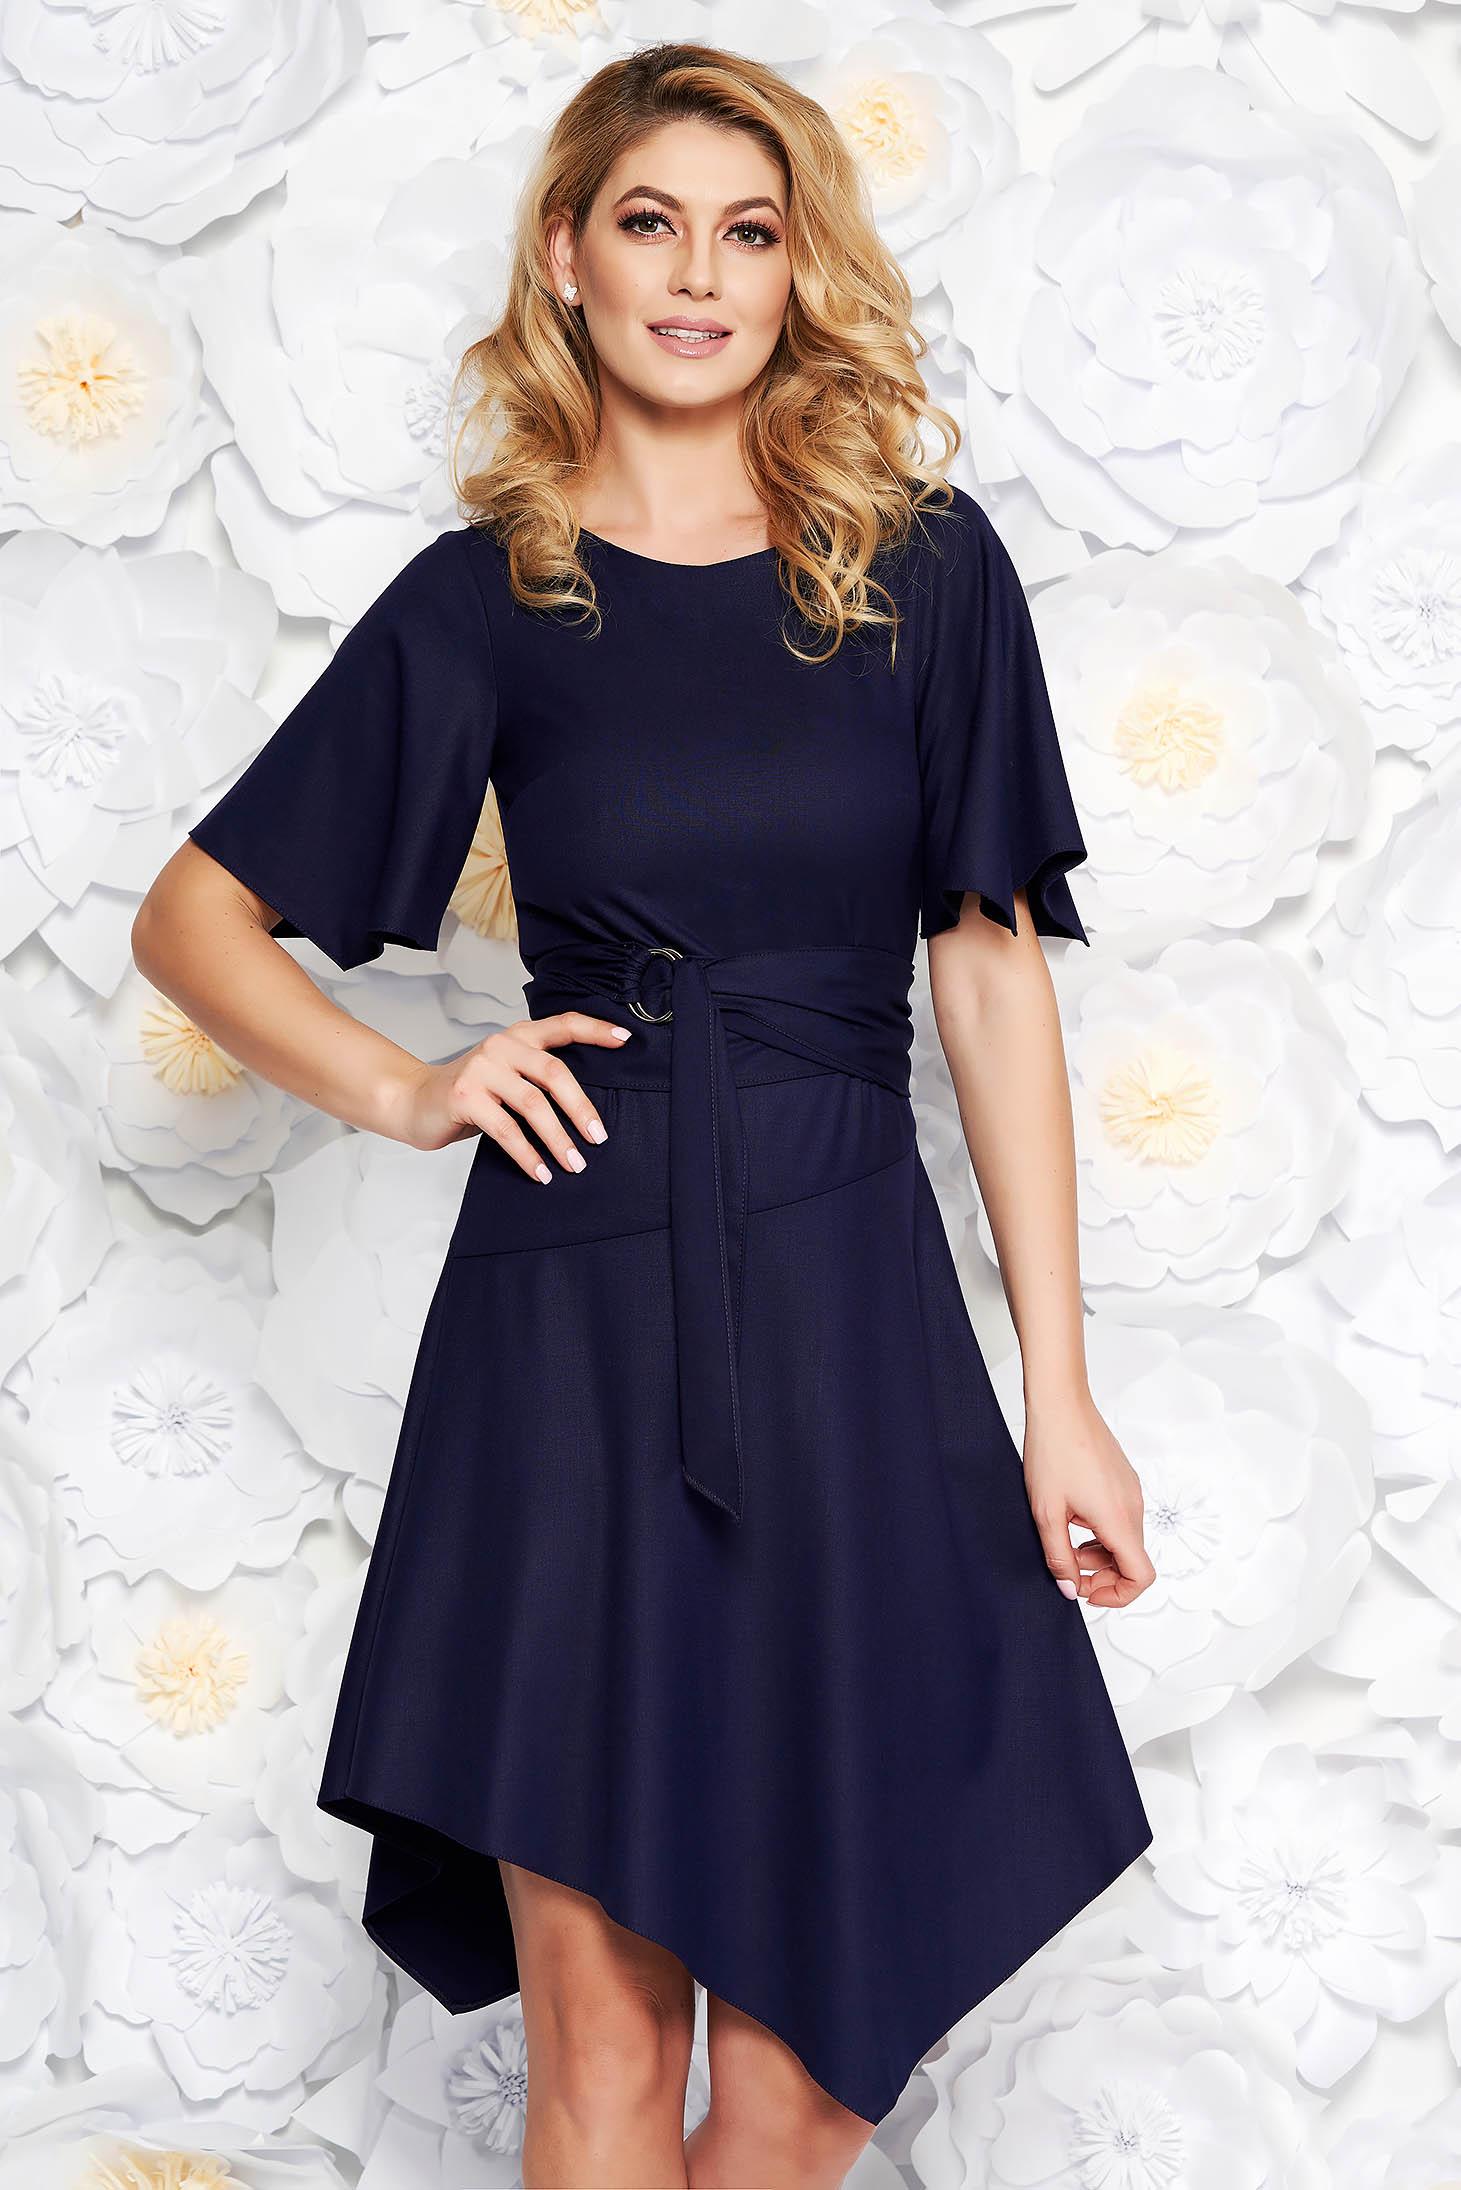 Rochie albastru-inchis de zi asimetrica din material fin la atingere accesorizata cu cordon